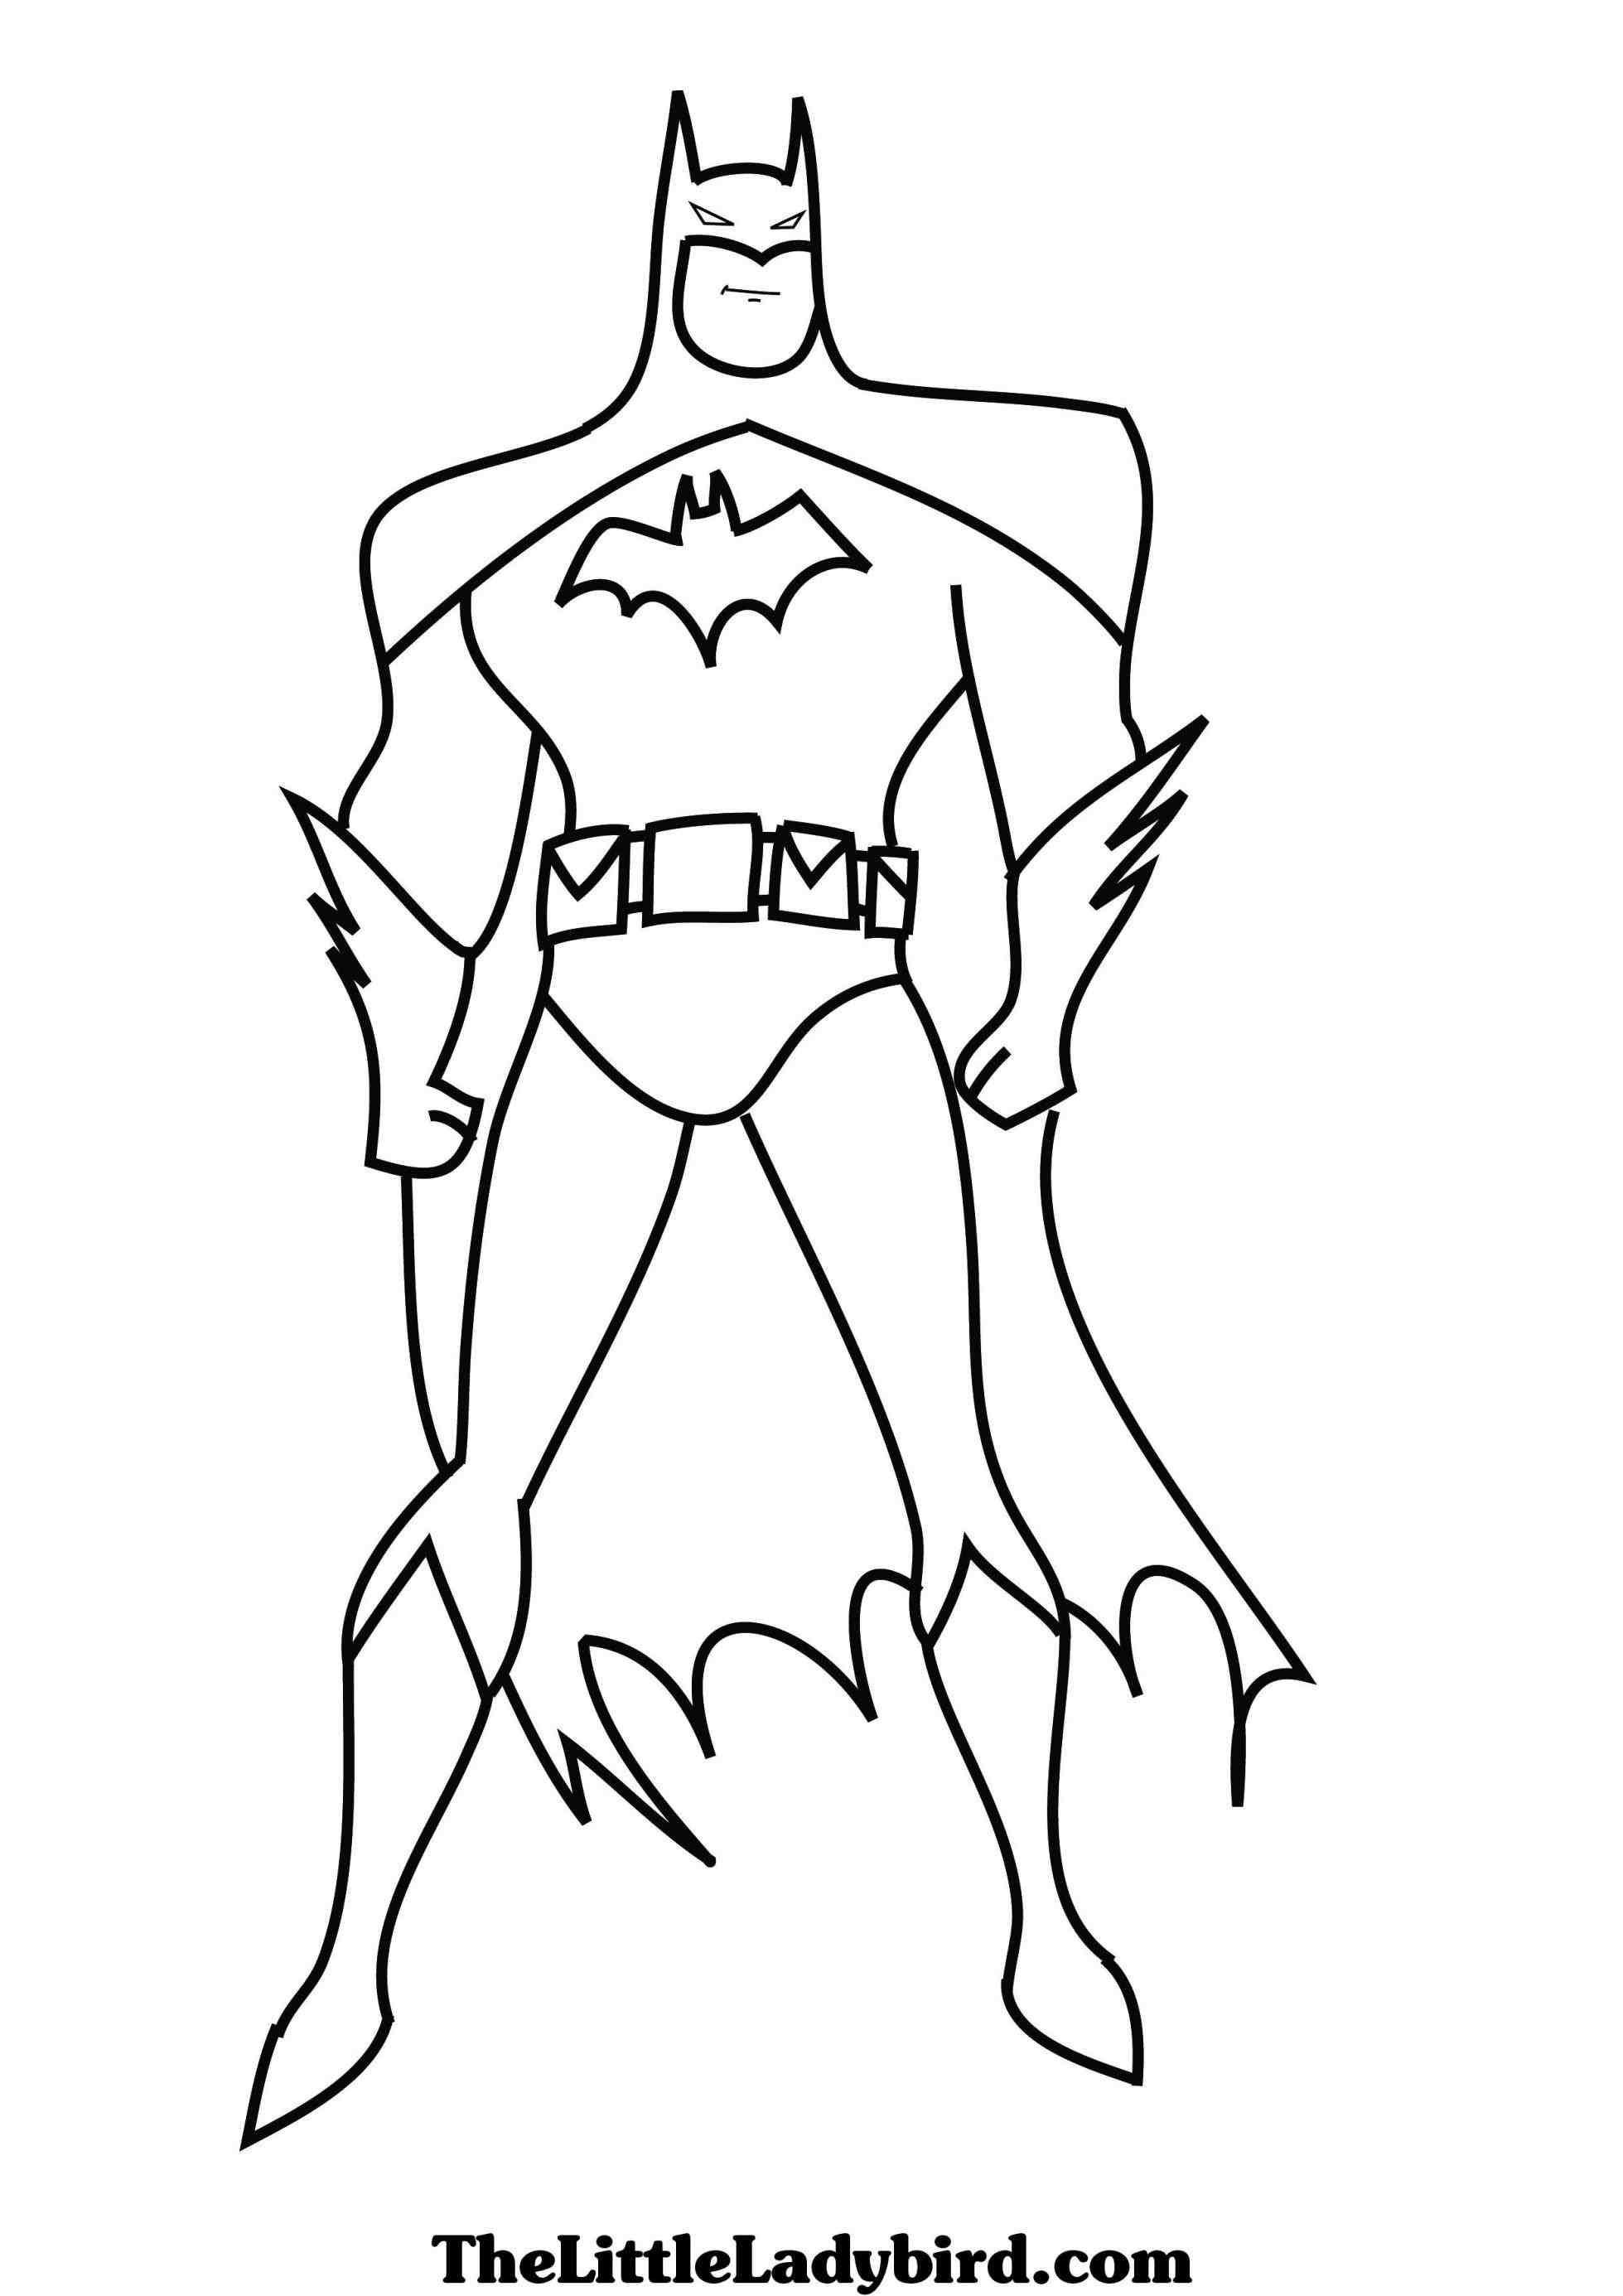 Batman clipart color, Batman color Transparent FREE for ...